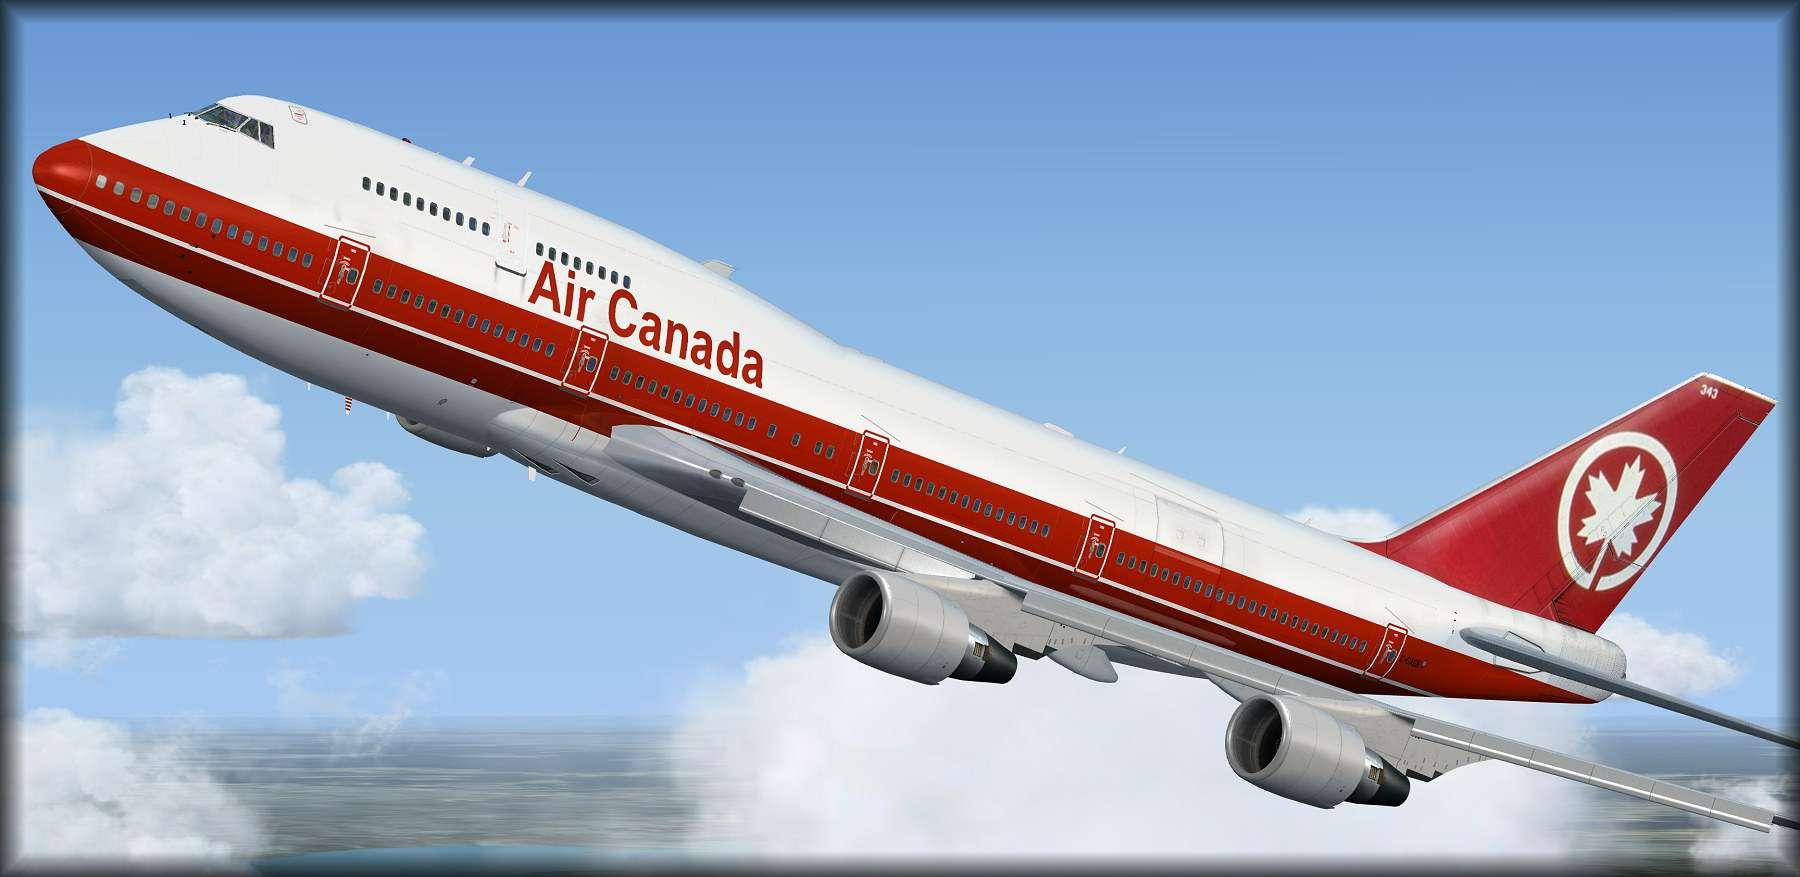 My favorite Air Canada livery      - The AVSIM Screen Shots